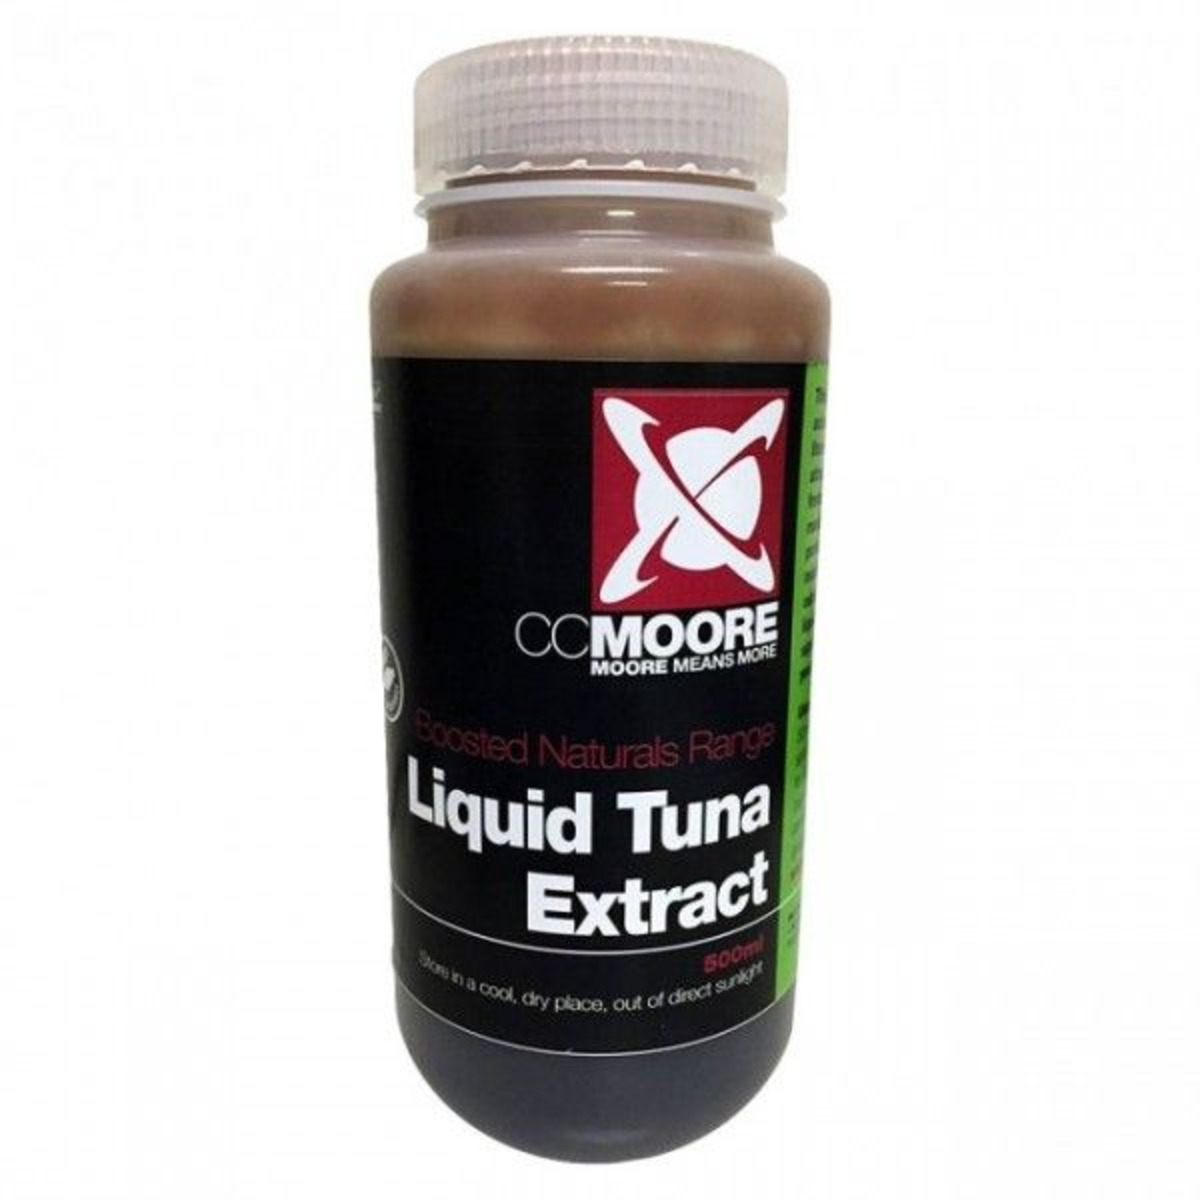 CC Moore Liquid Tuna Ext - 500 ml